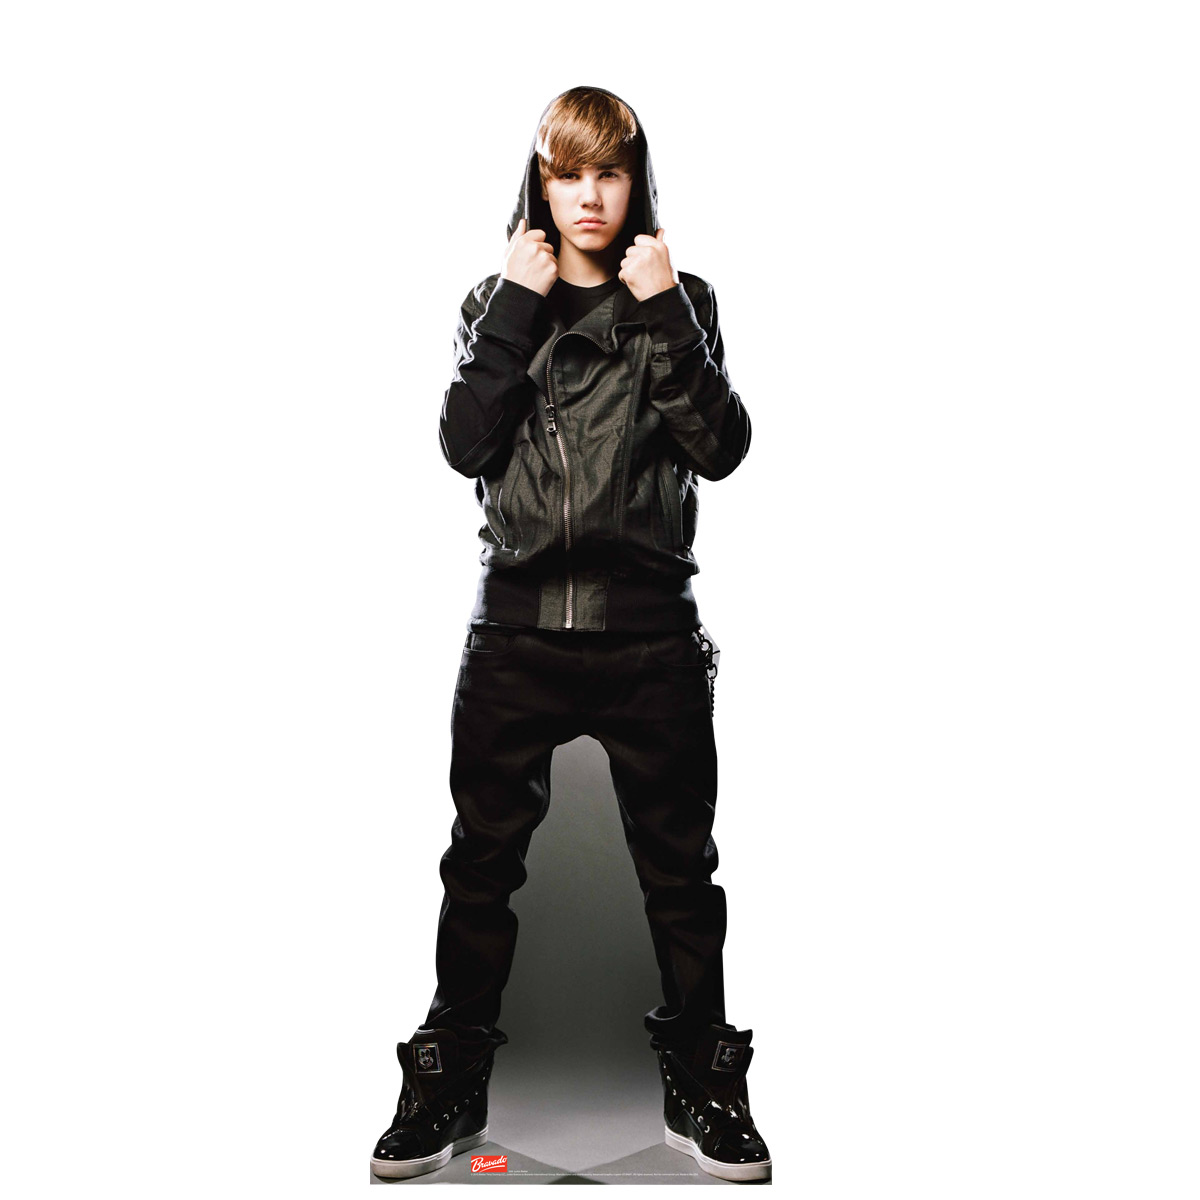 Justin Bieber in Jacket